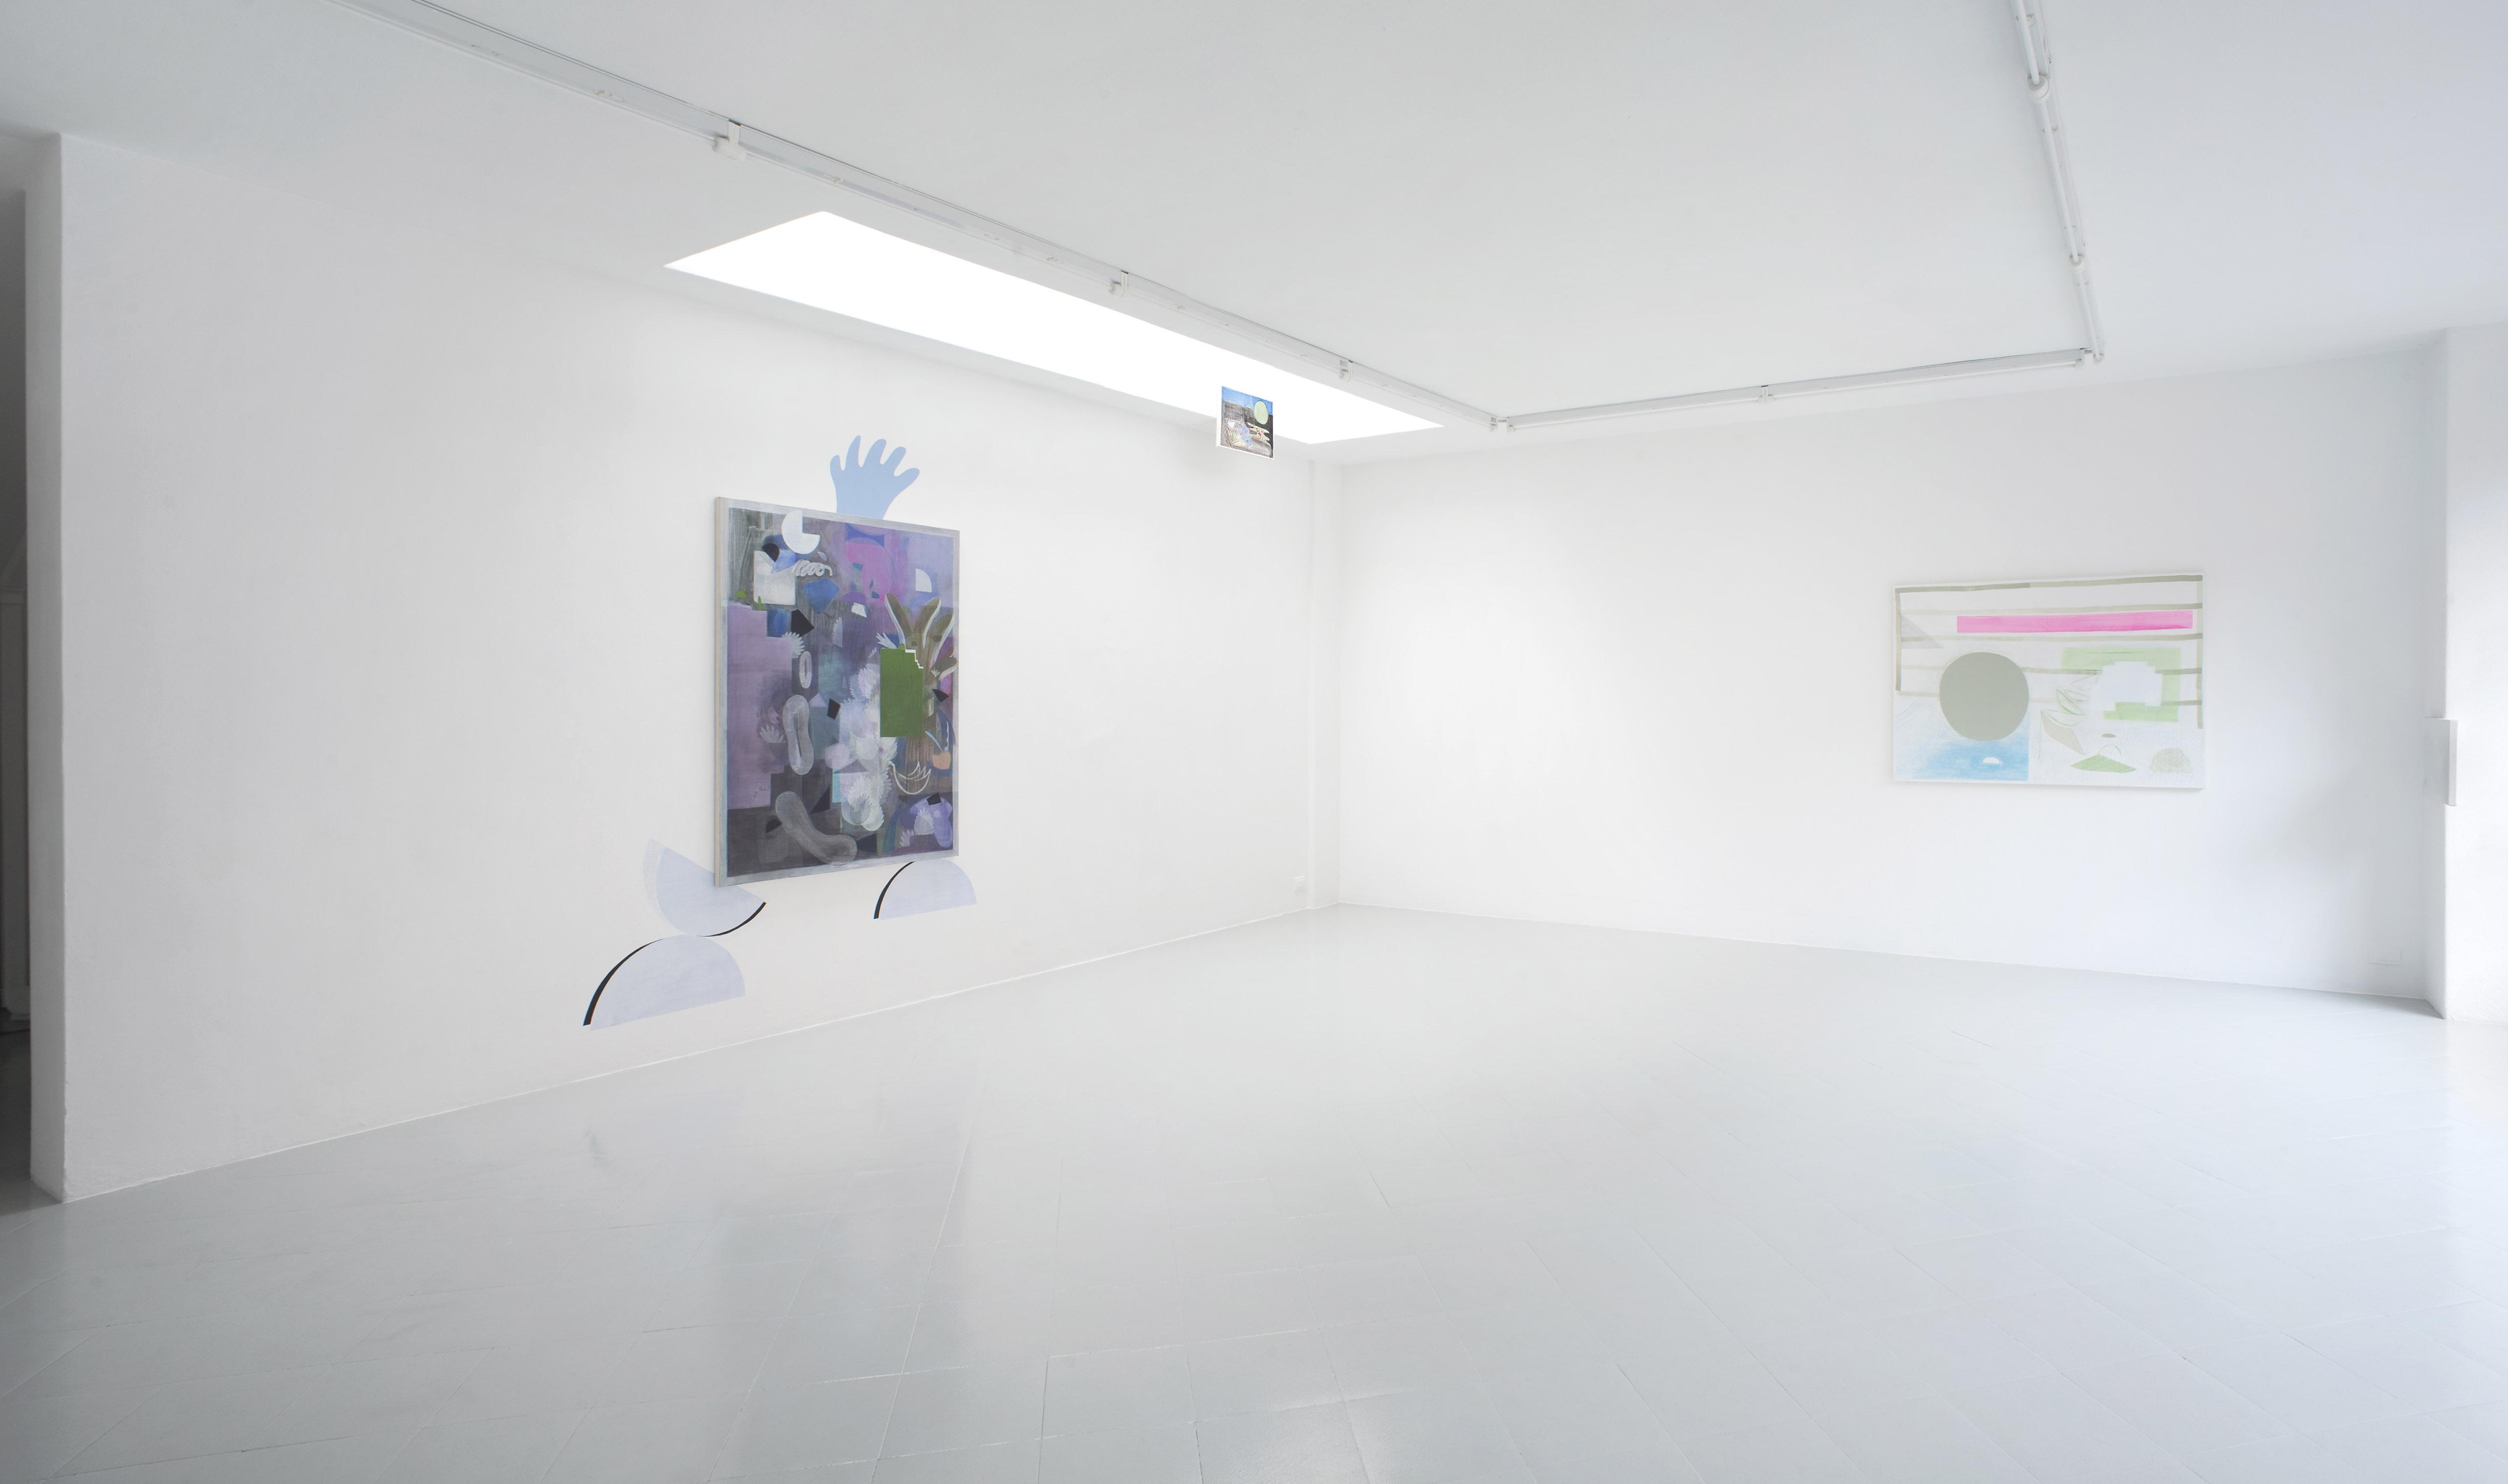 1a - Charlotte Herzig Stanchezza Passeggera Installation View 2016 Courtesy Studiolo Milan - photo Filippo Armellin